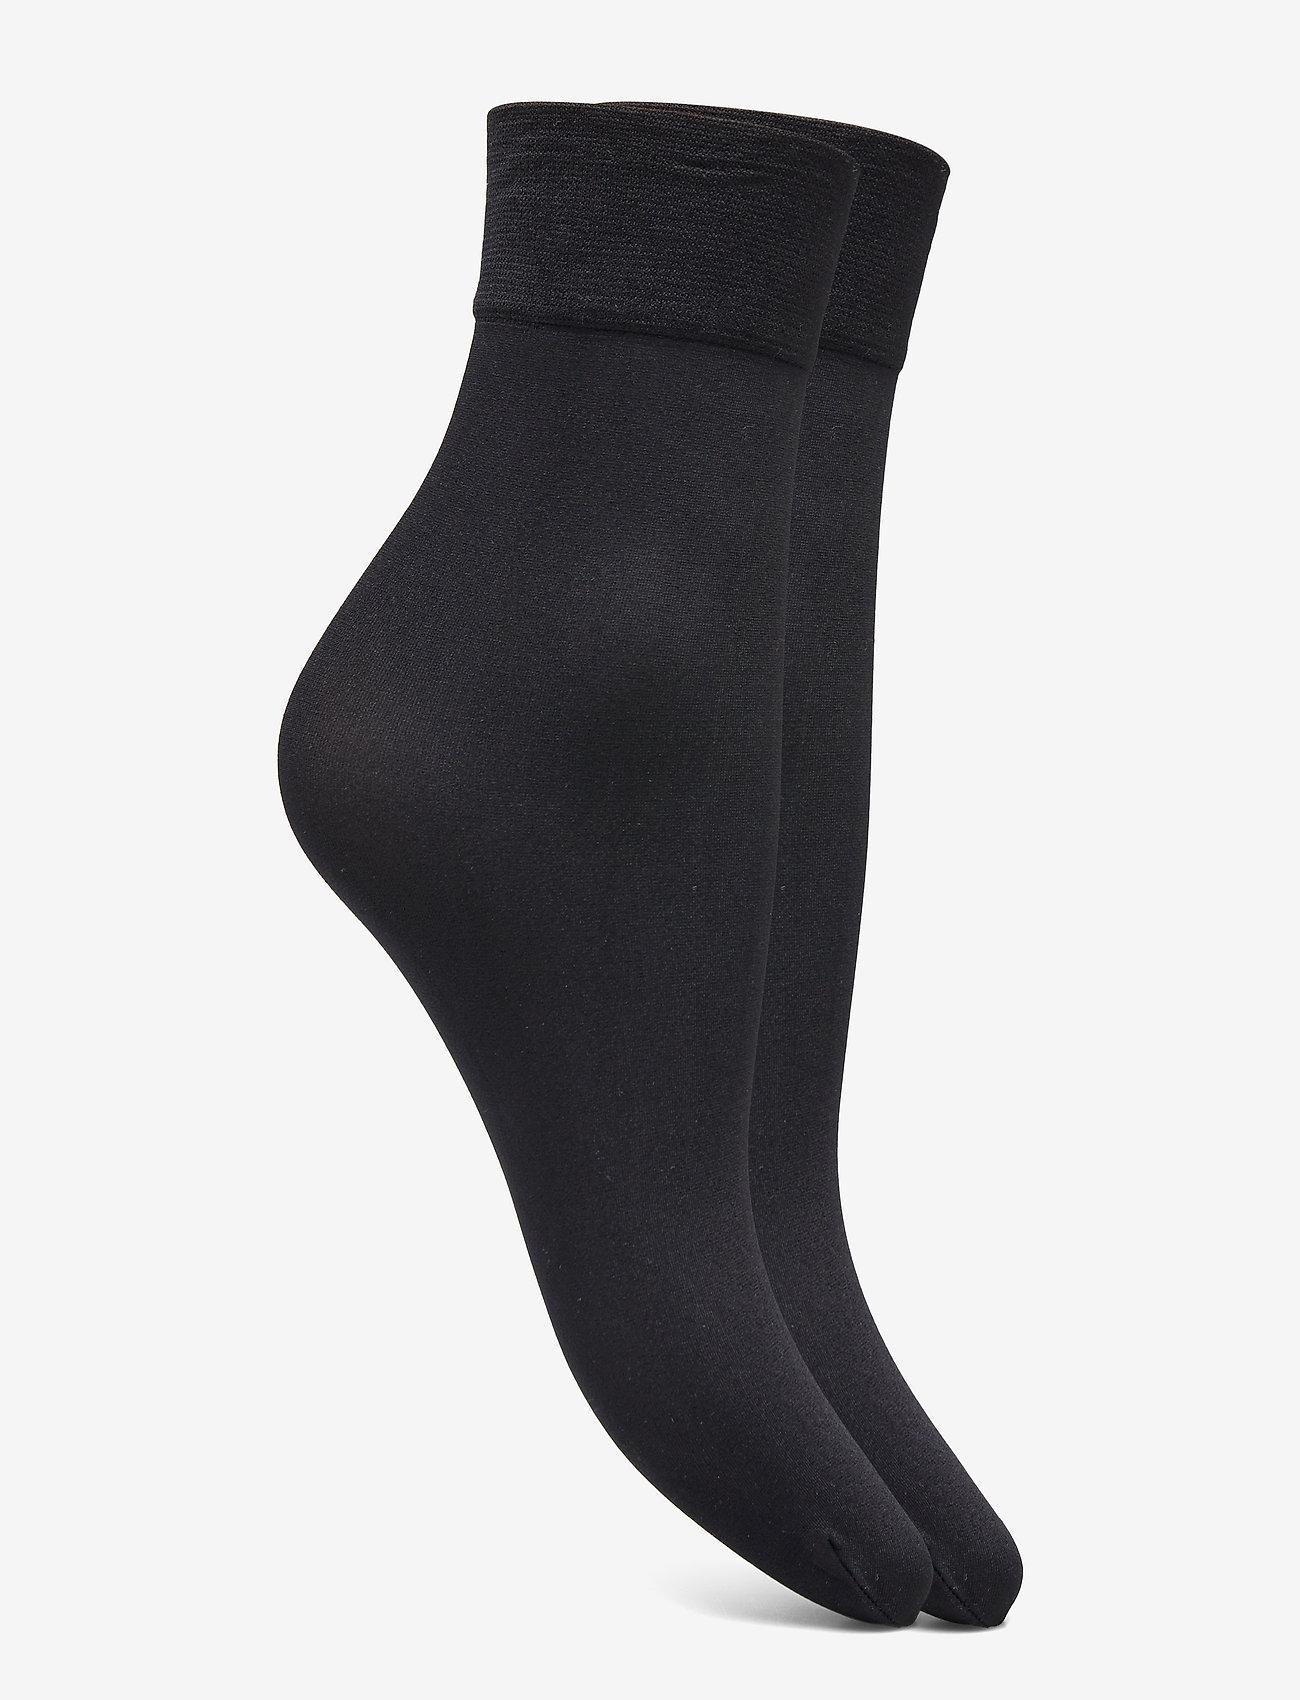 Decoy - DECOY ankle sock micro 2-pk 60 - chaussettes sport - svart - 1